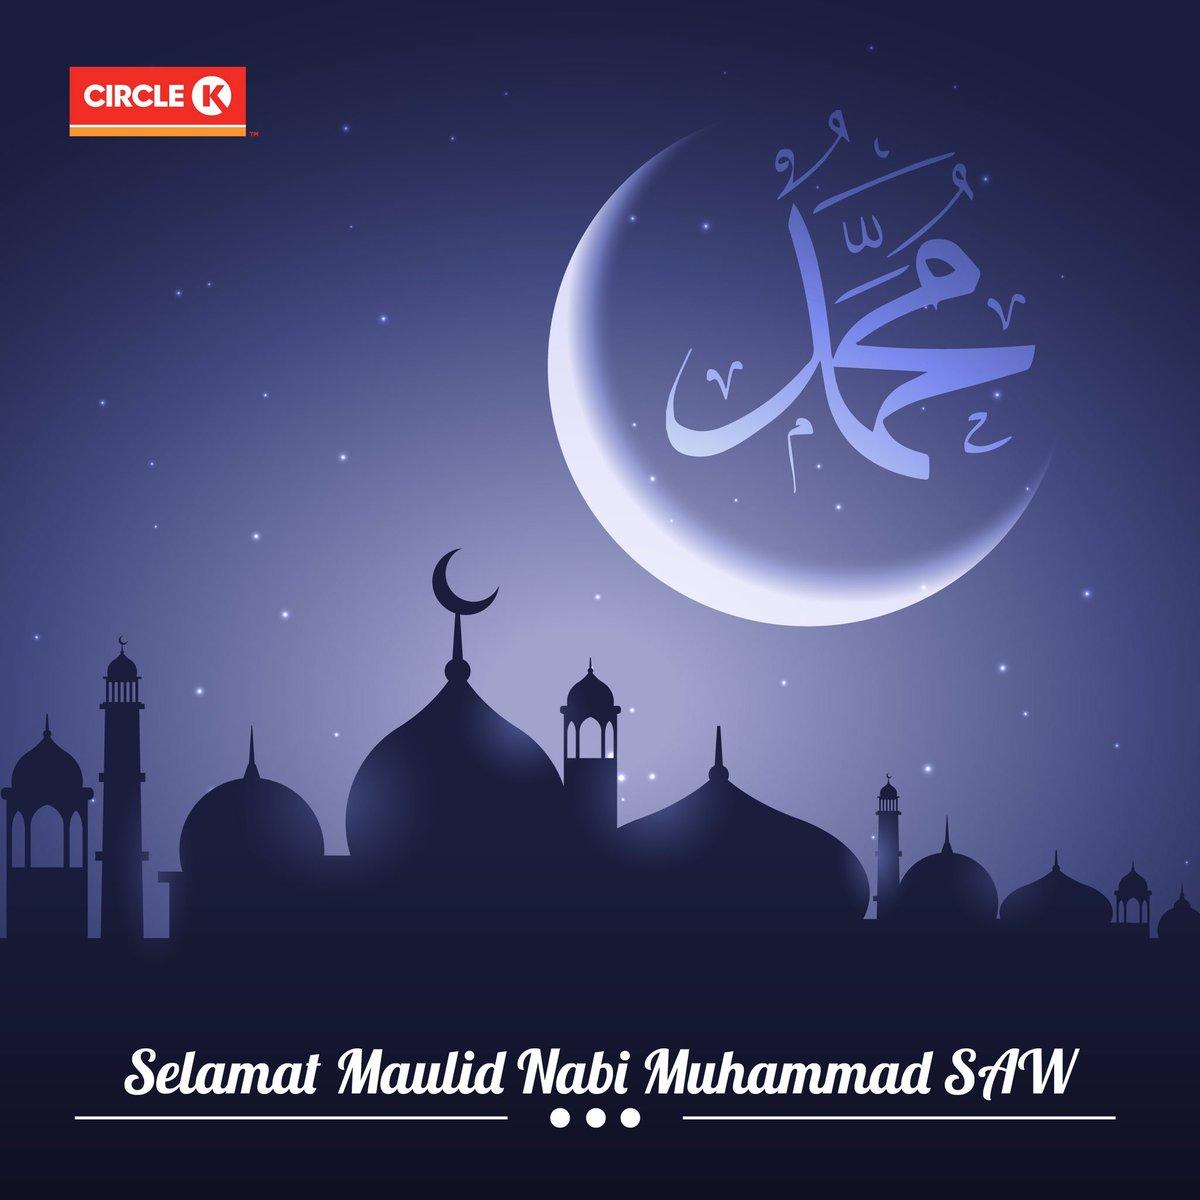 Kumpulan Gambar Ucapan Maulid Nabi Muhammad SAW 2018 2019 Novelrw